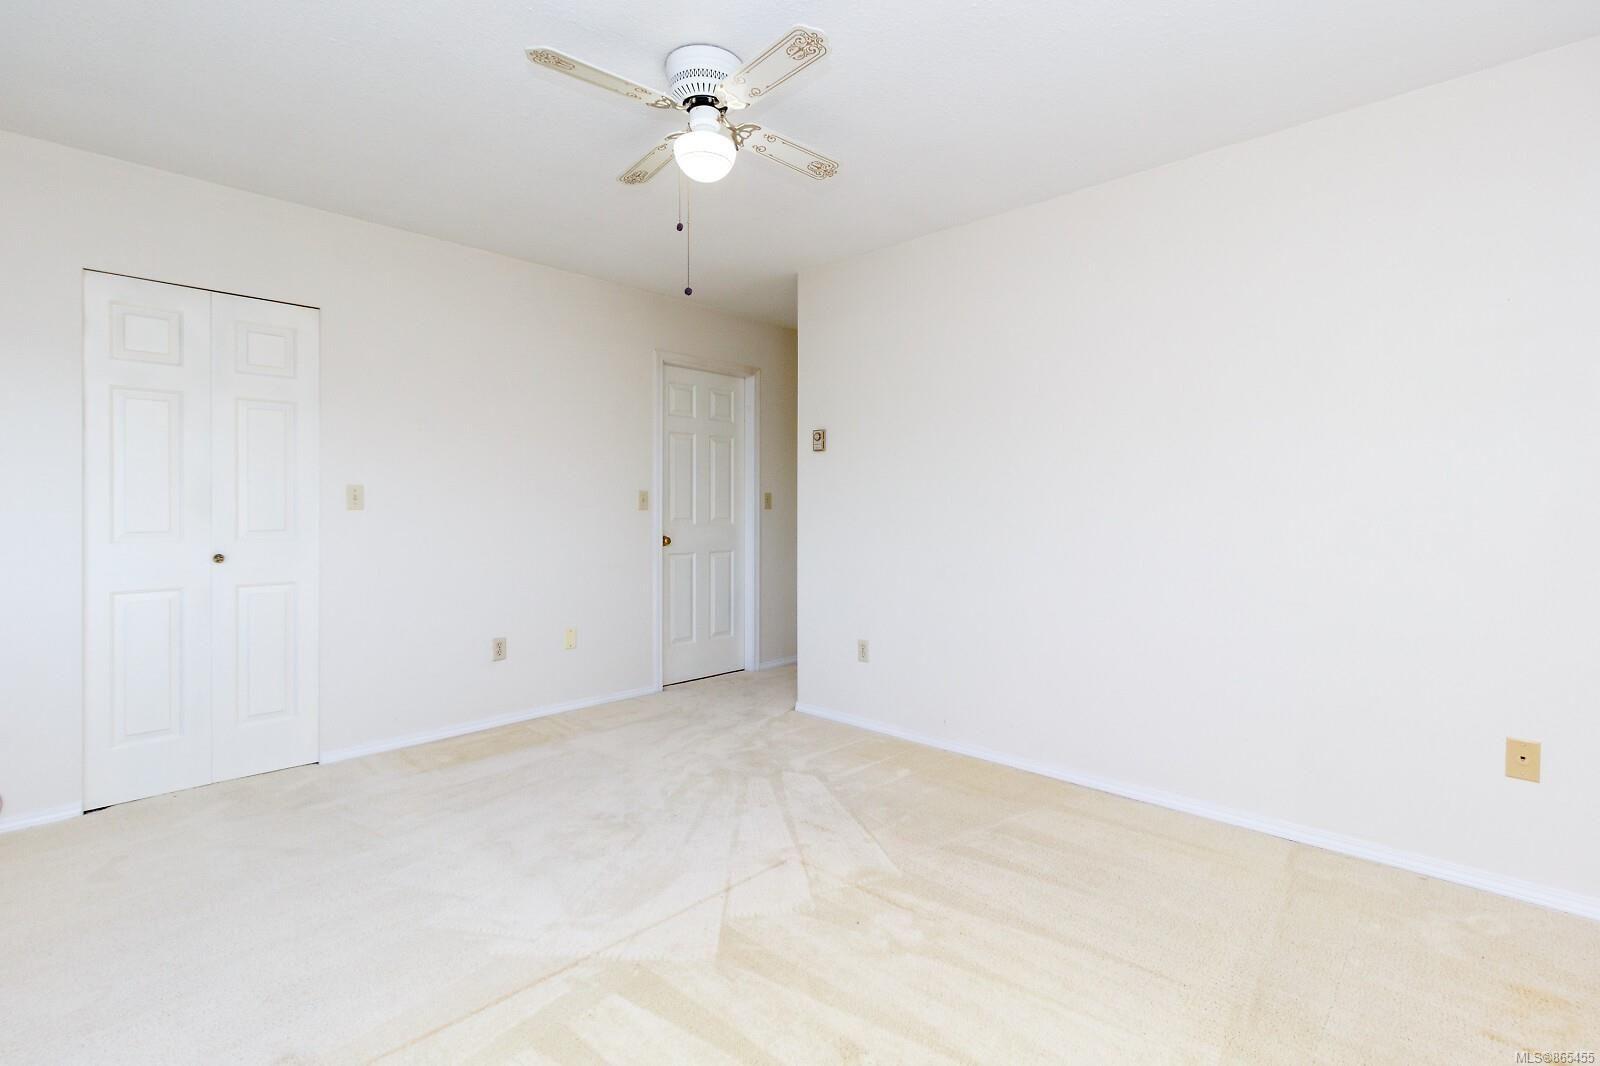 Photo 16: Photos: 399 Beech Ave in : Du East Duncan House for sale (Duncan)  : MLS®# 865455